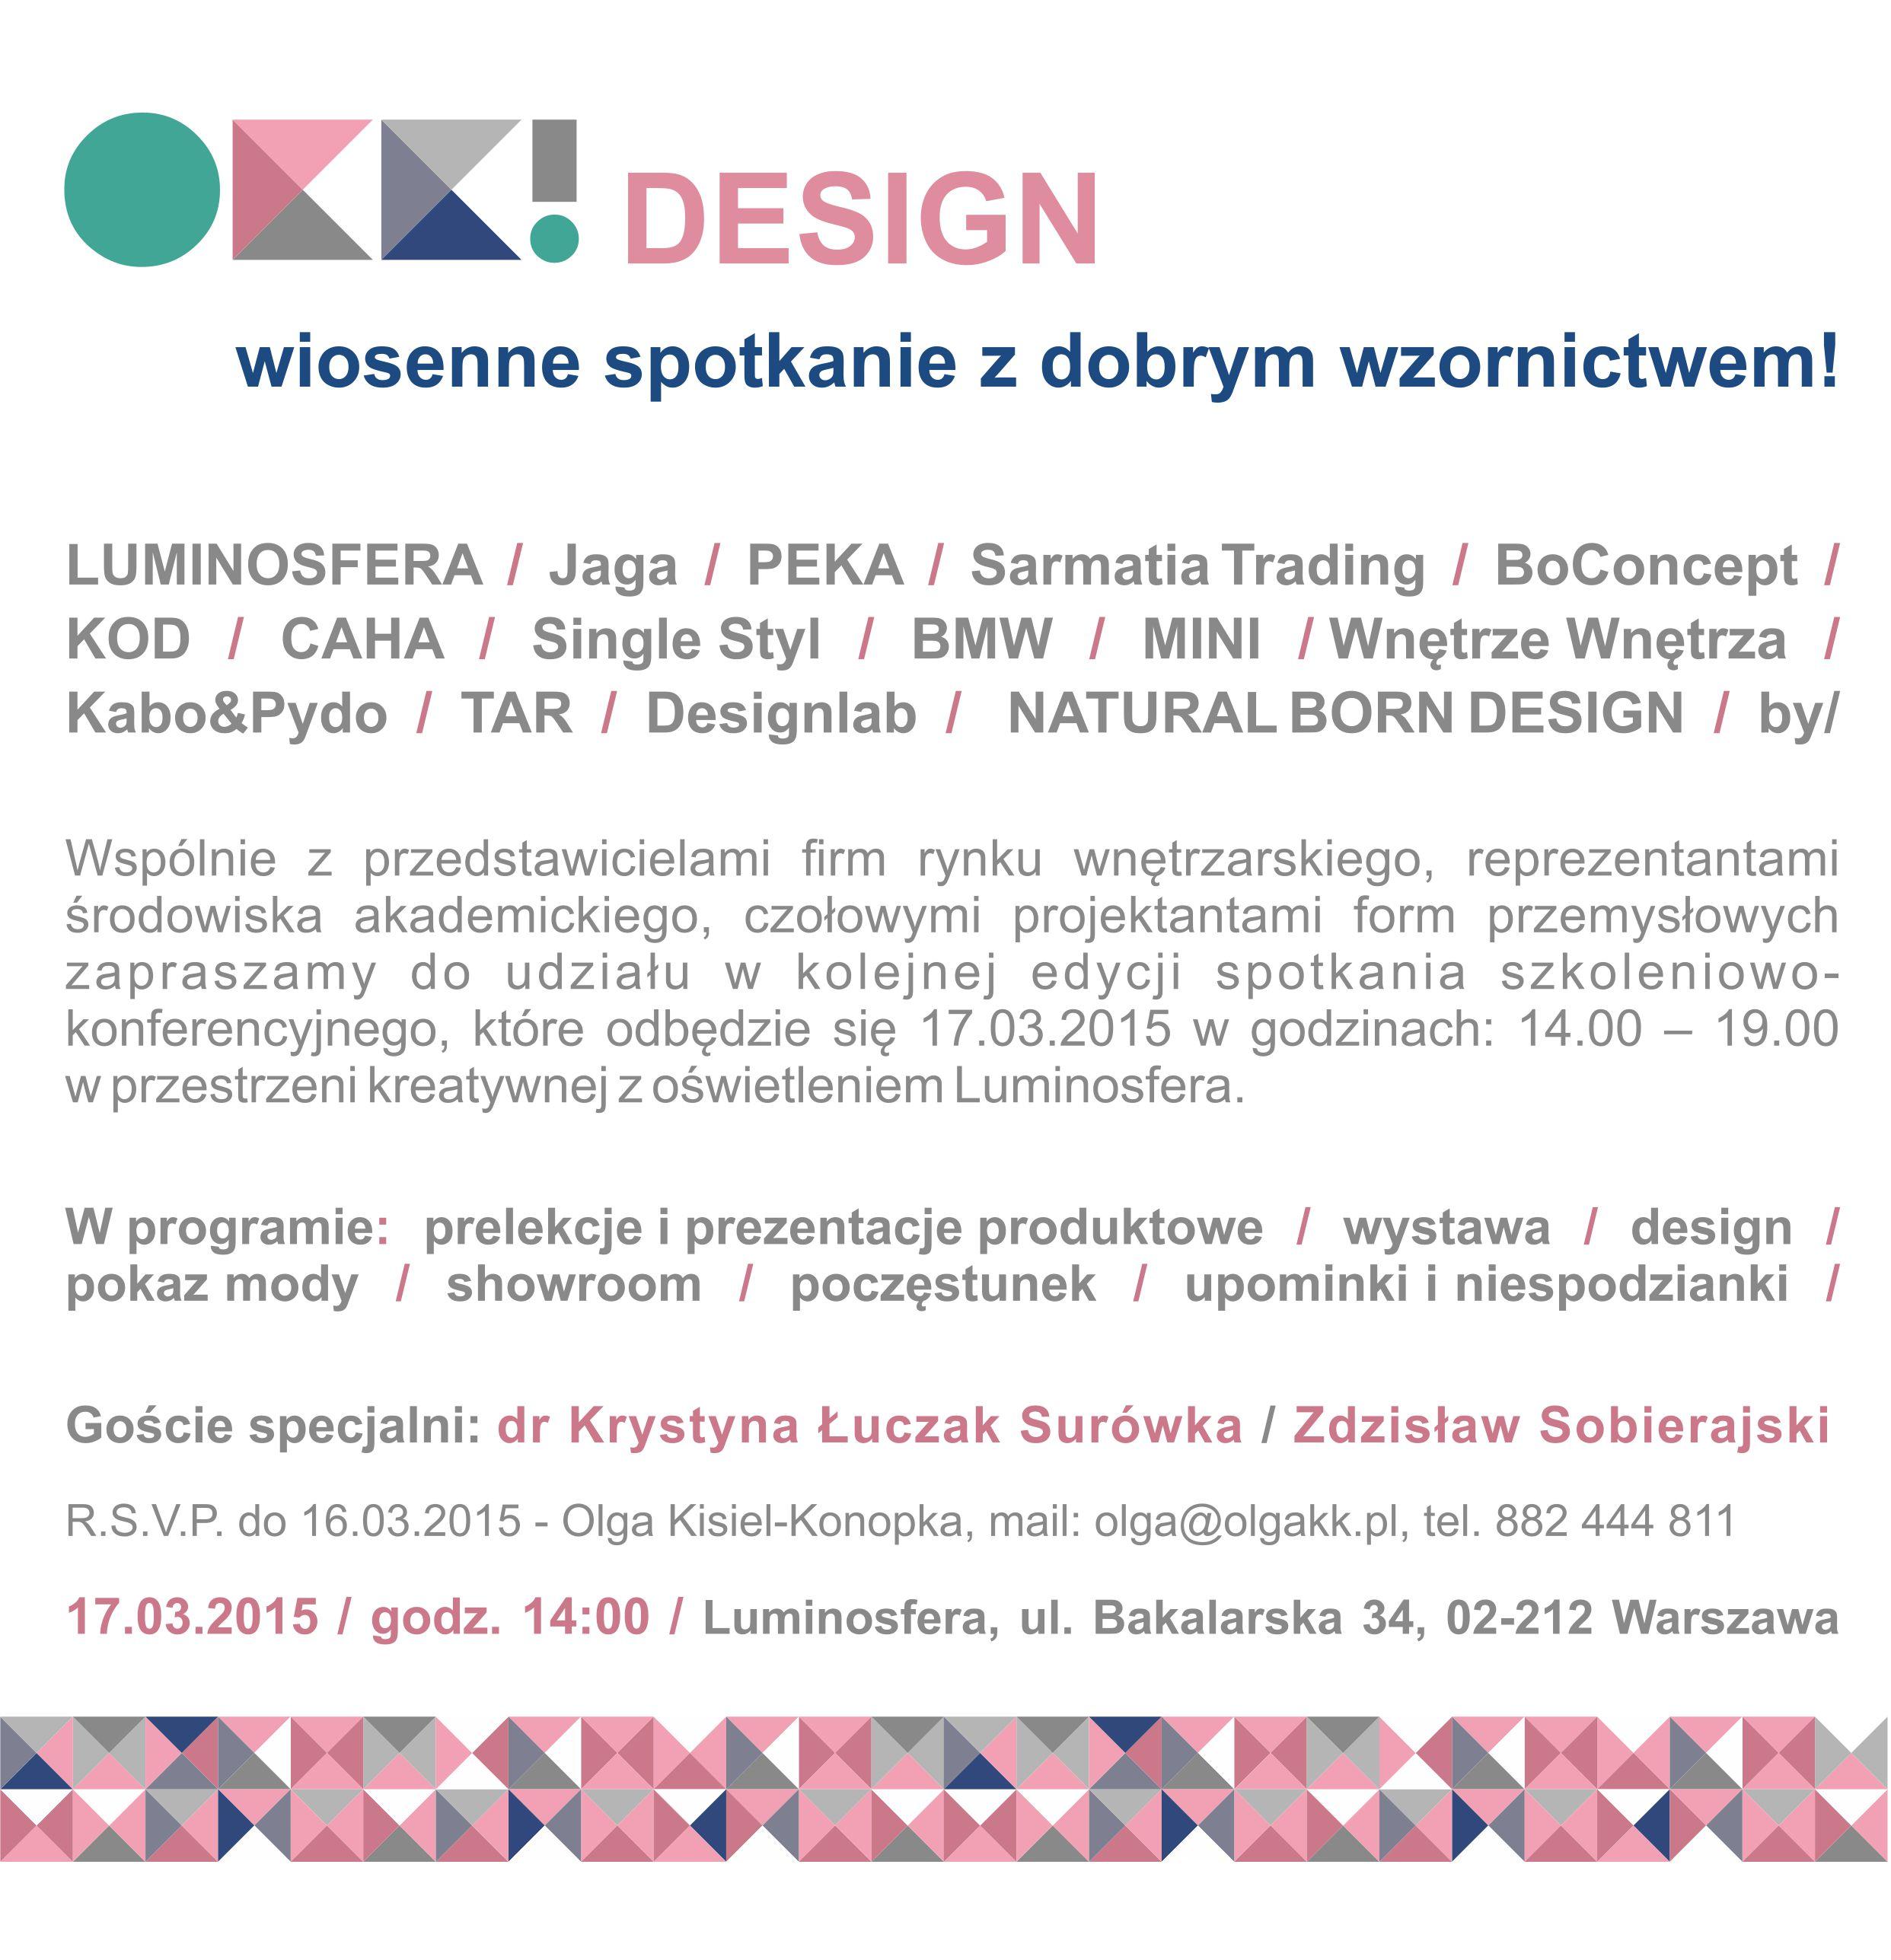 OKK! design ZAPROSZENIE